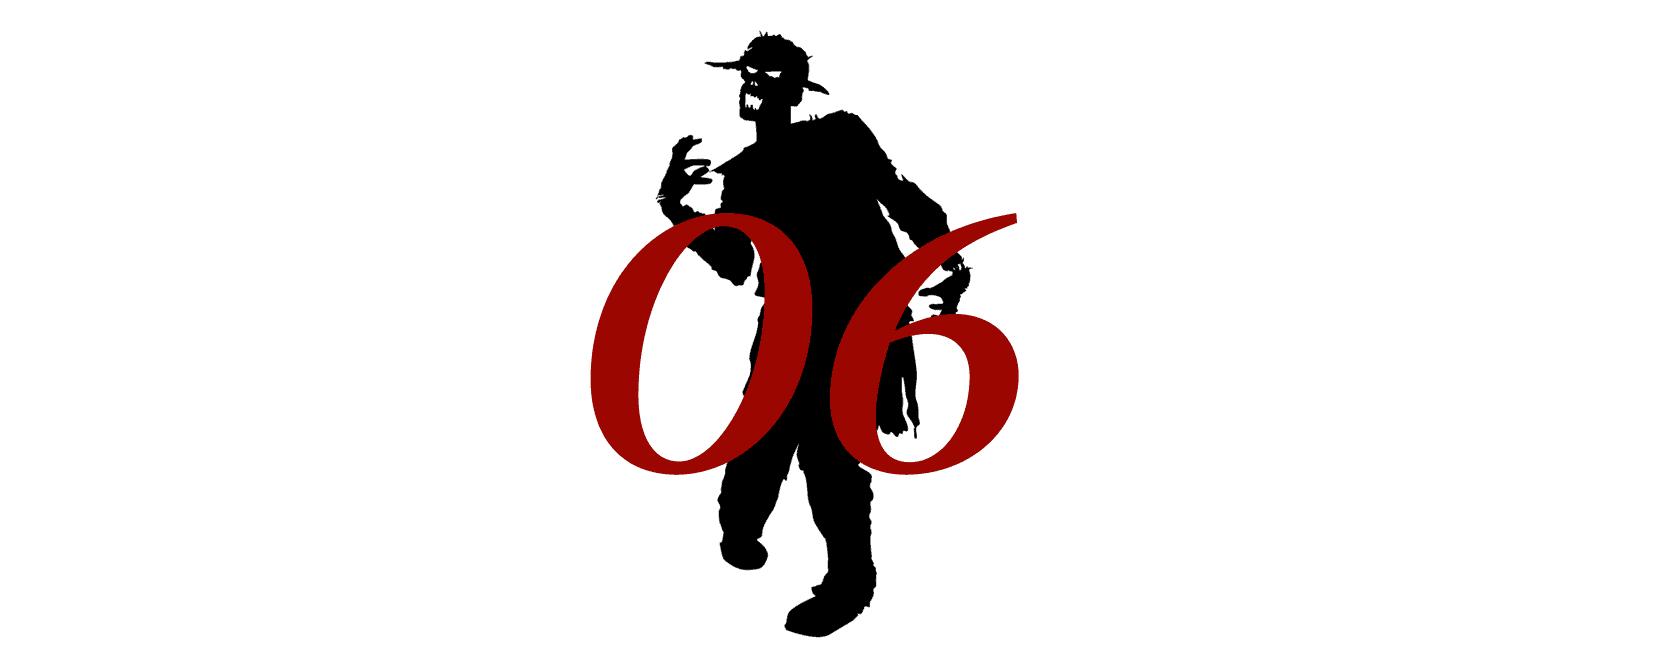 Zahlengrafik_06_2015